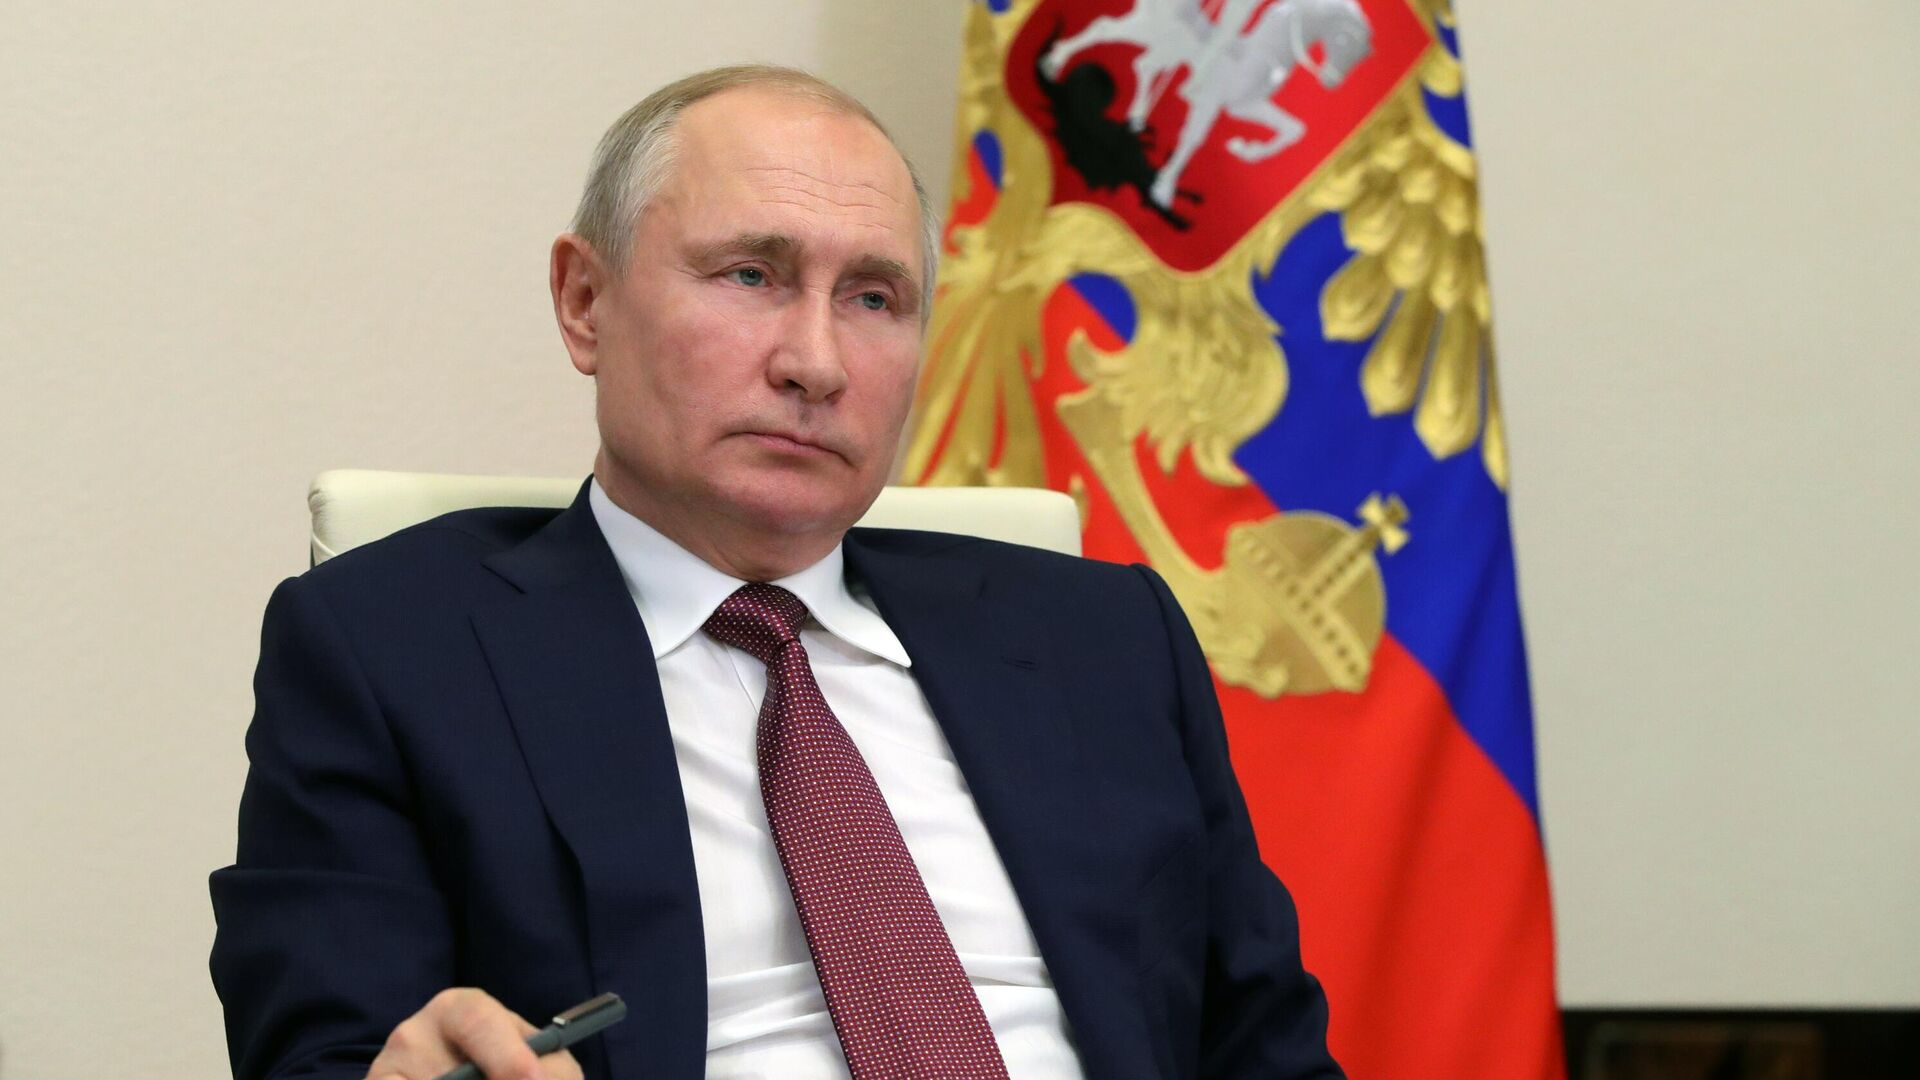 Президент РФ Владимир Путин - РИА Новости, 1920, 16.02.2021